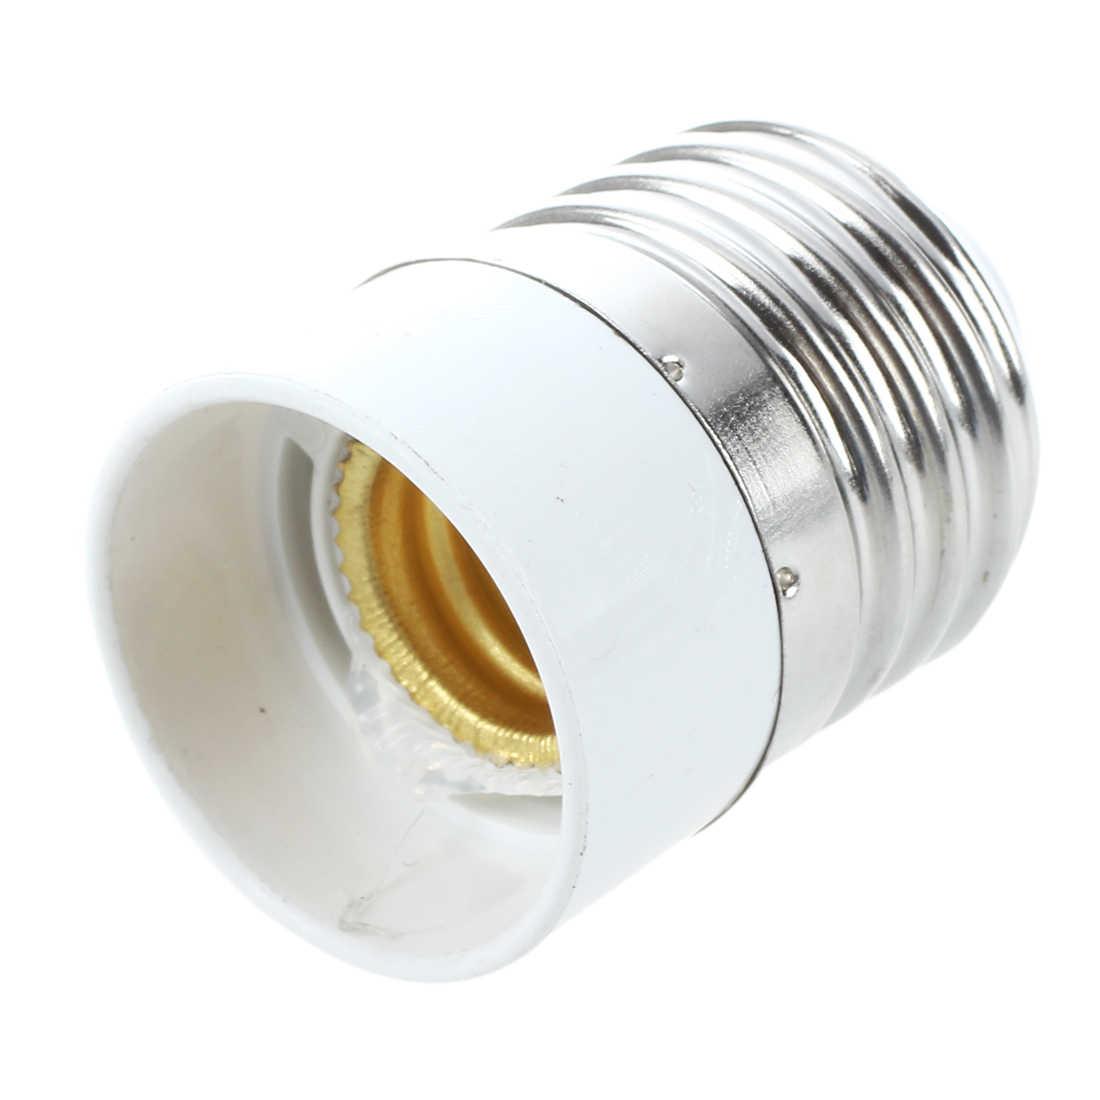 Adapter E27 Spot light bulb socket base to E14